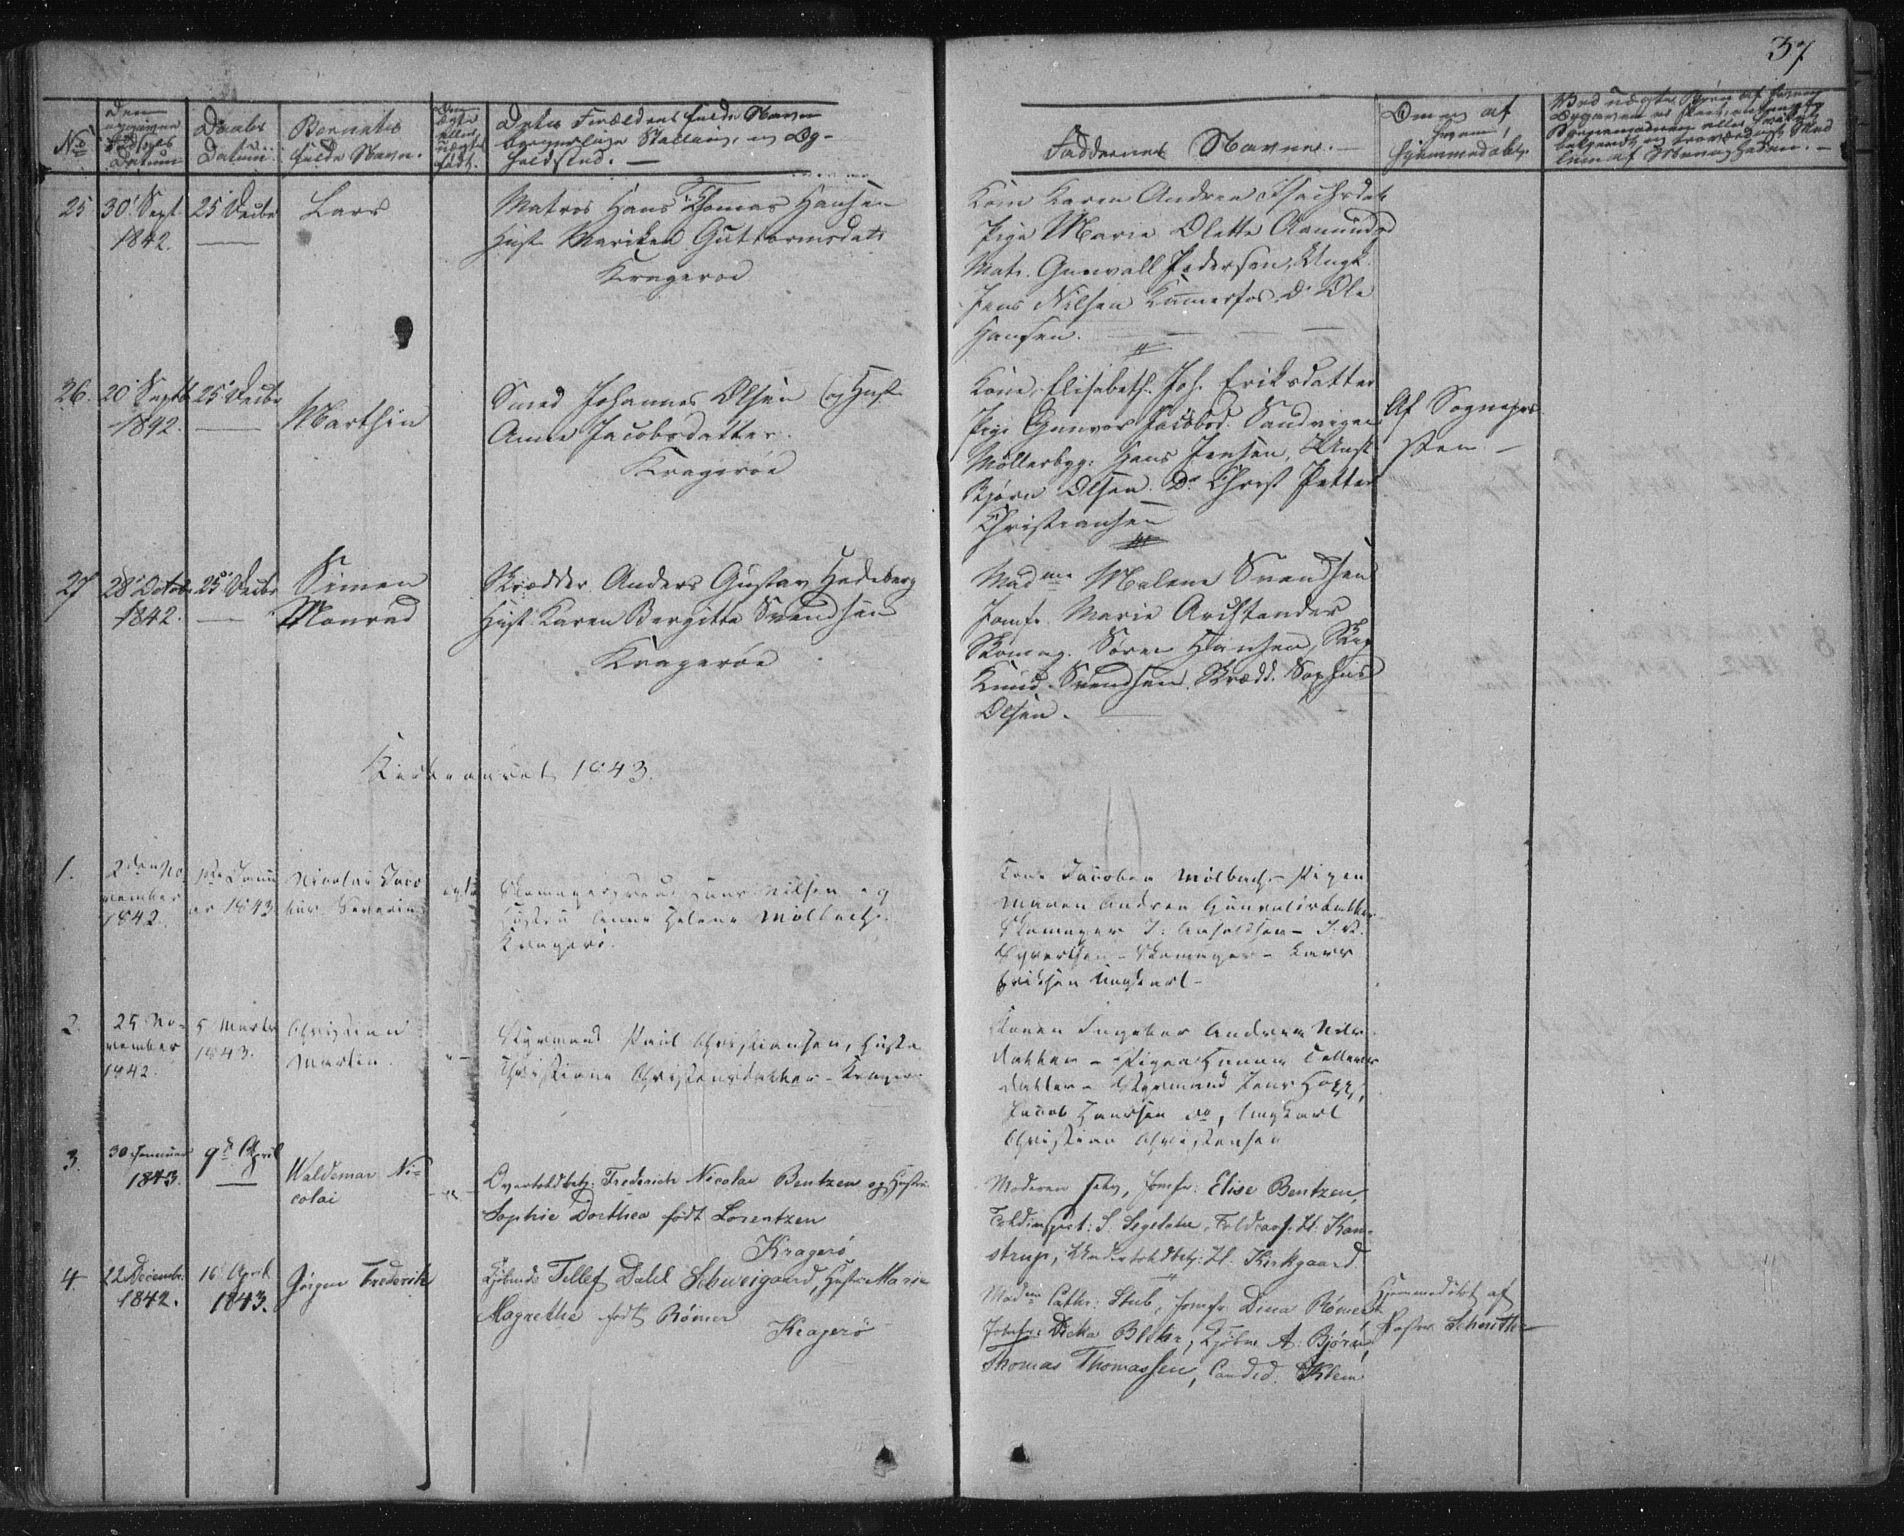 SAKO, Kragerø kirkebøker, F/Fa/L0005: Ministerialbok nr. 5, 1832-1847, s. 37